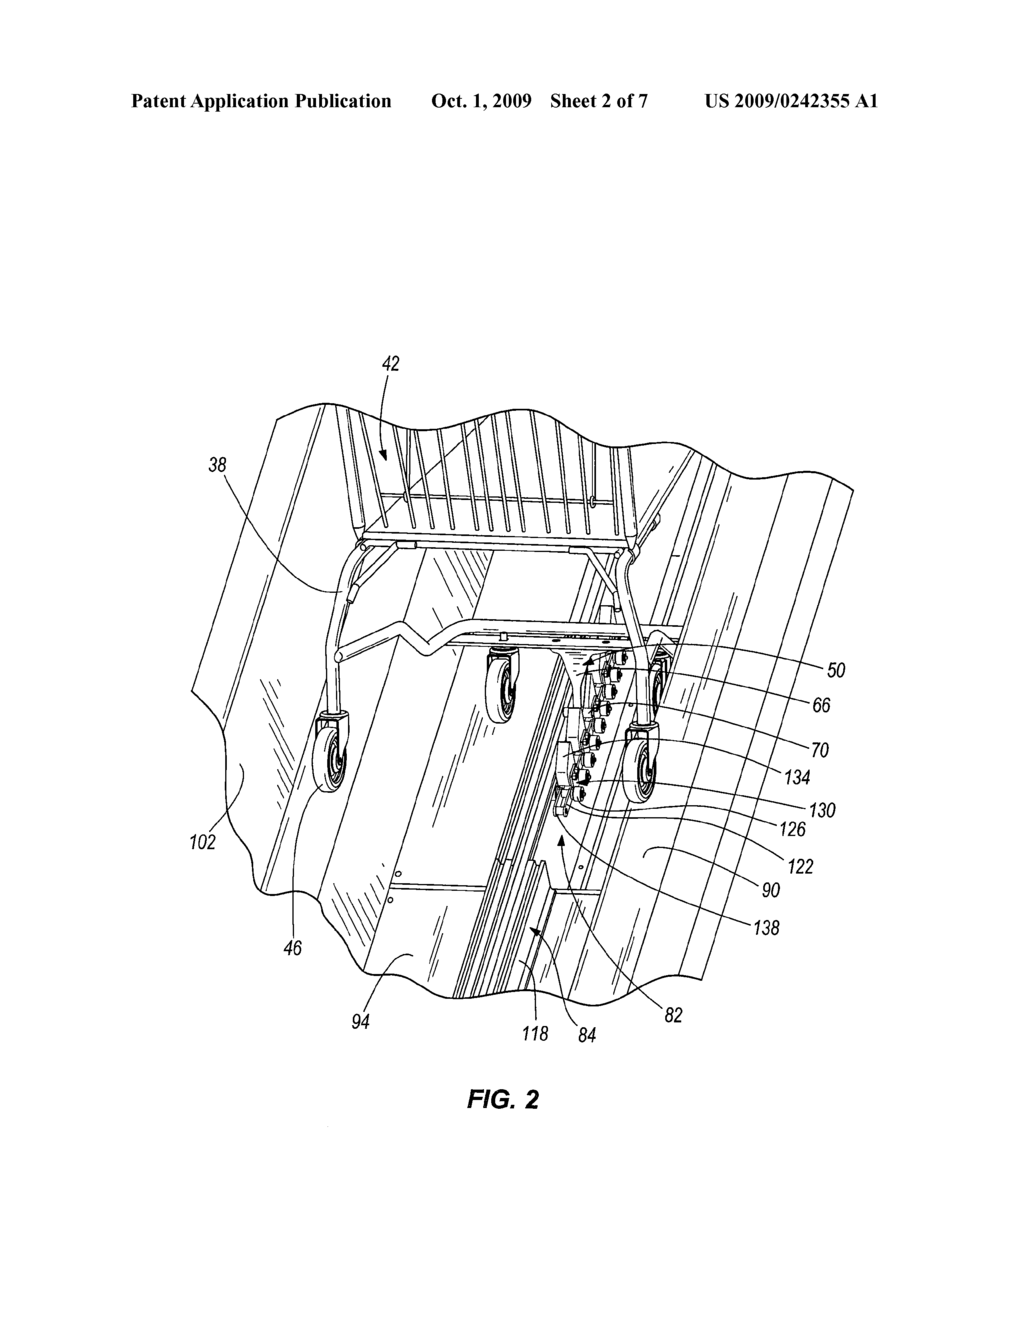 Jam Sensor For Shopping Cart Conveyor Diagram Schematic And Image 03